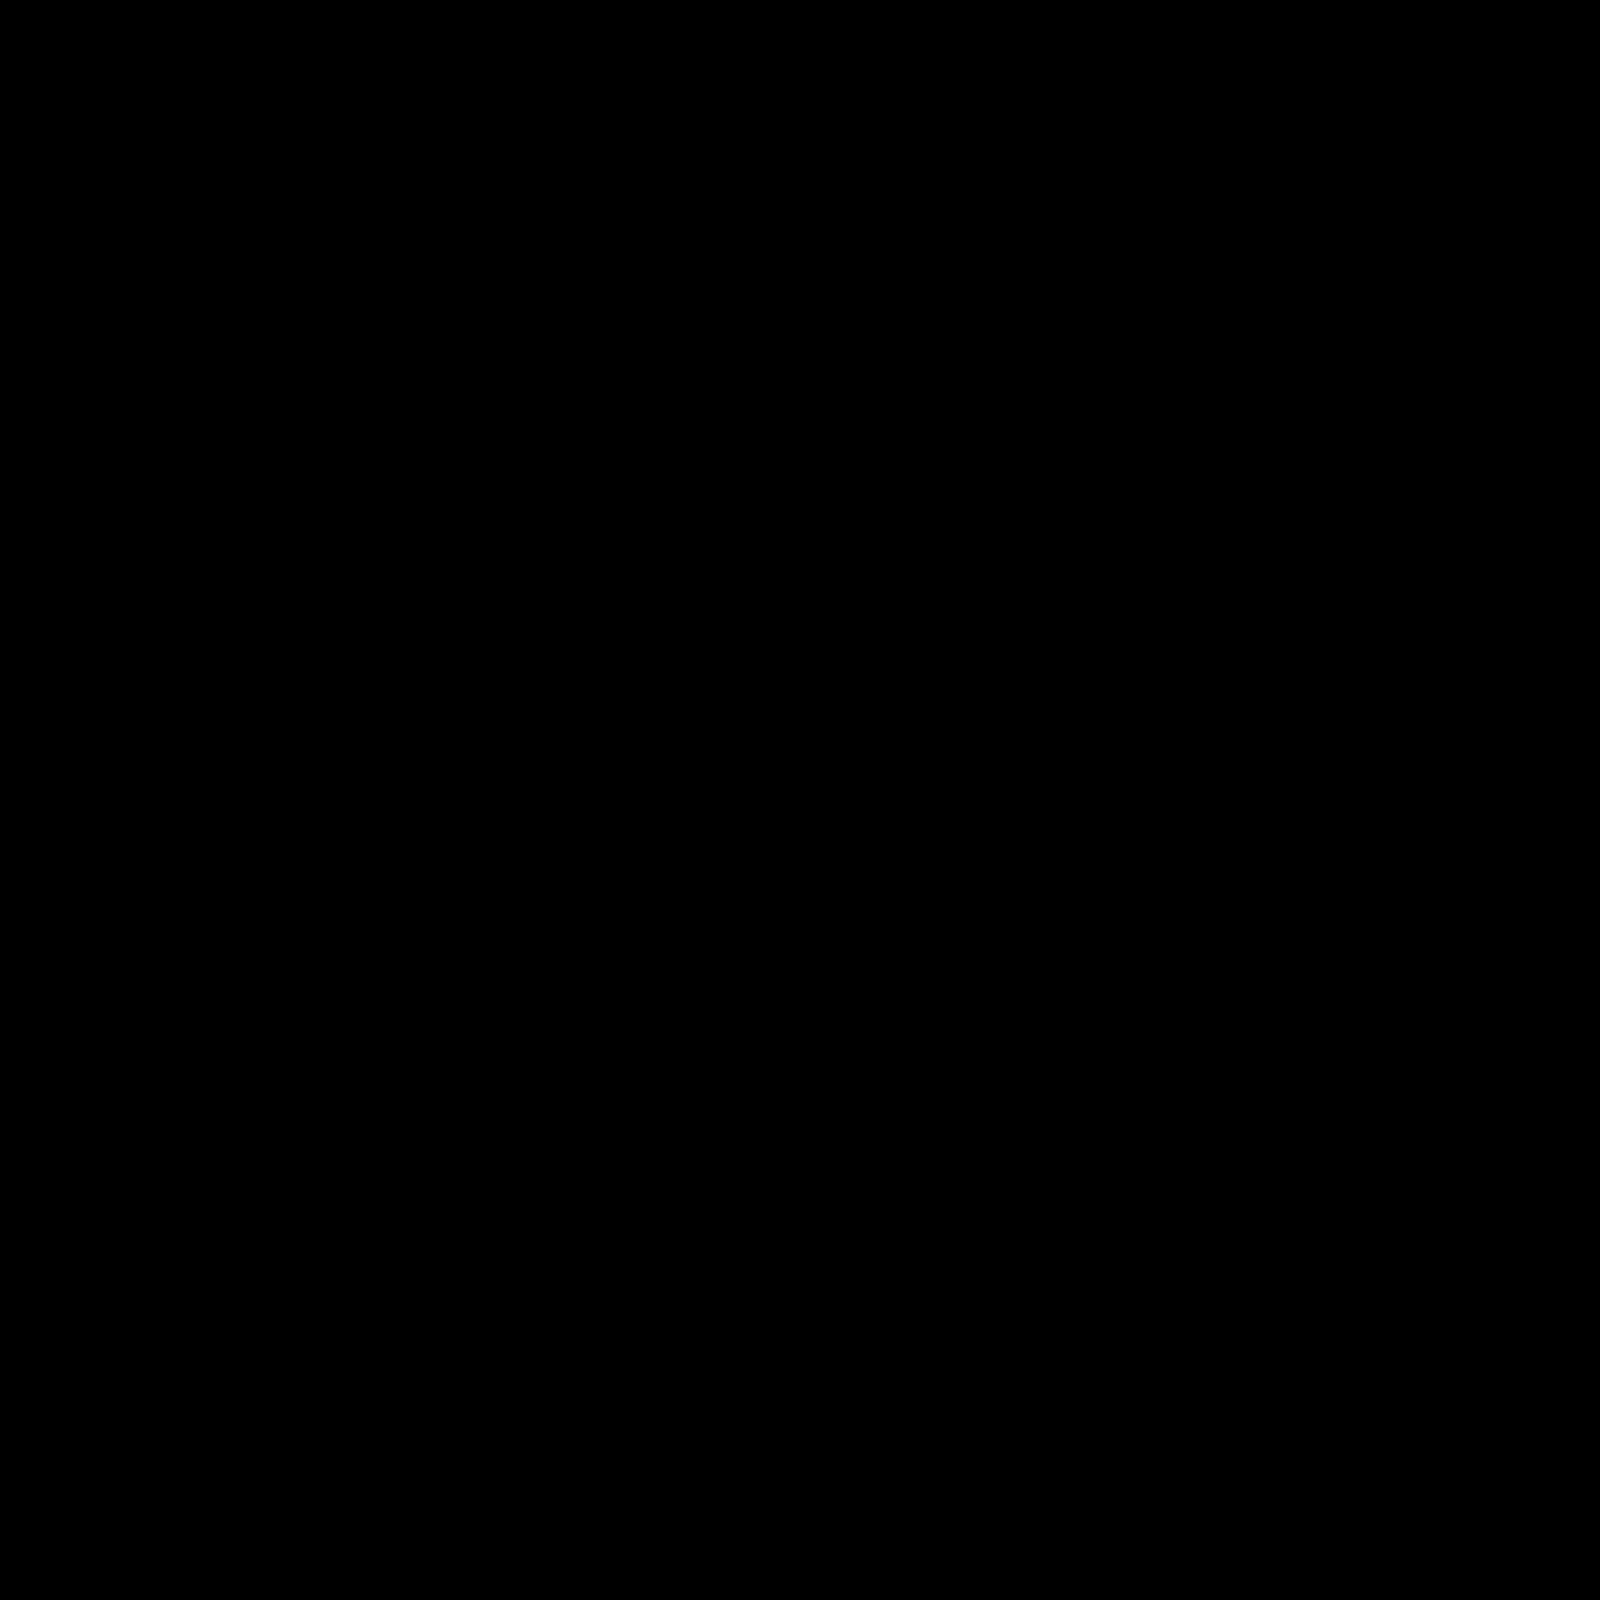 Spellcheck Filled icon